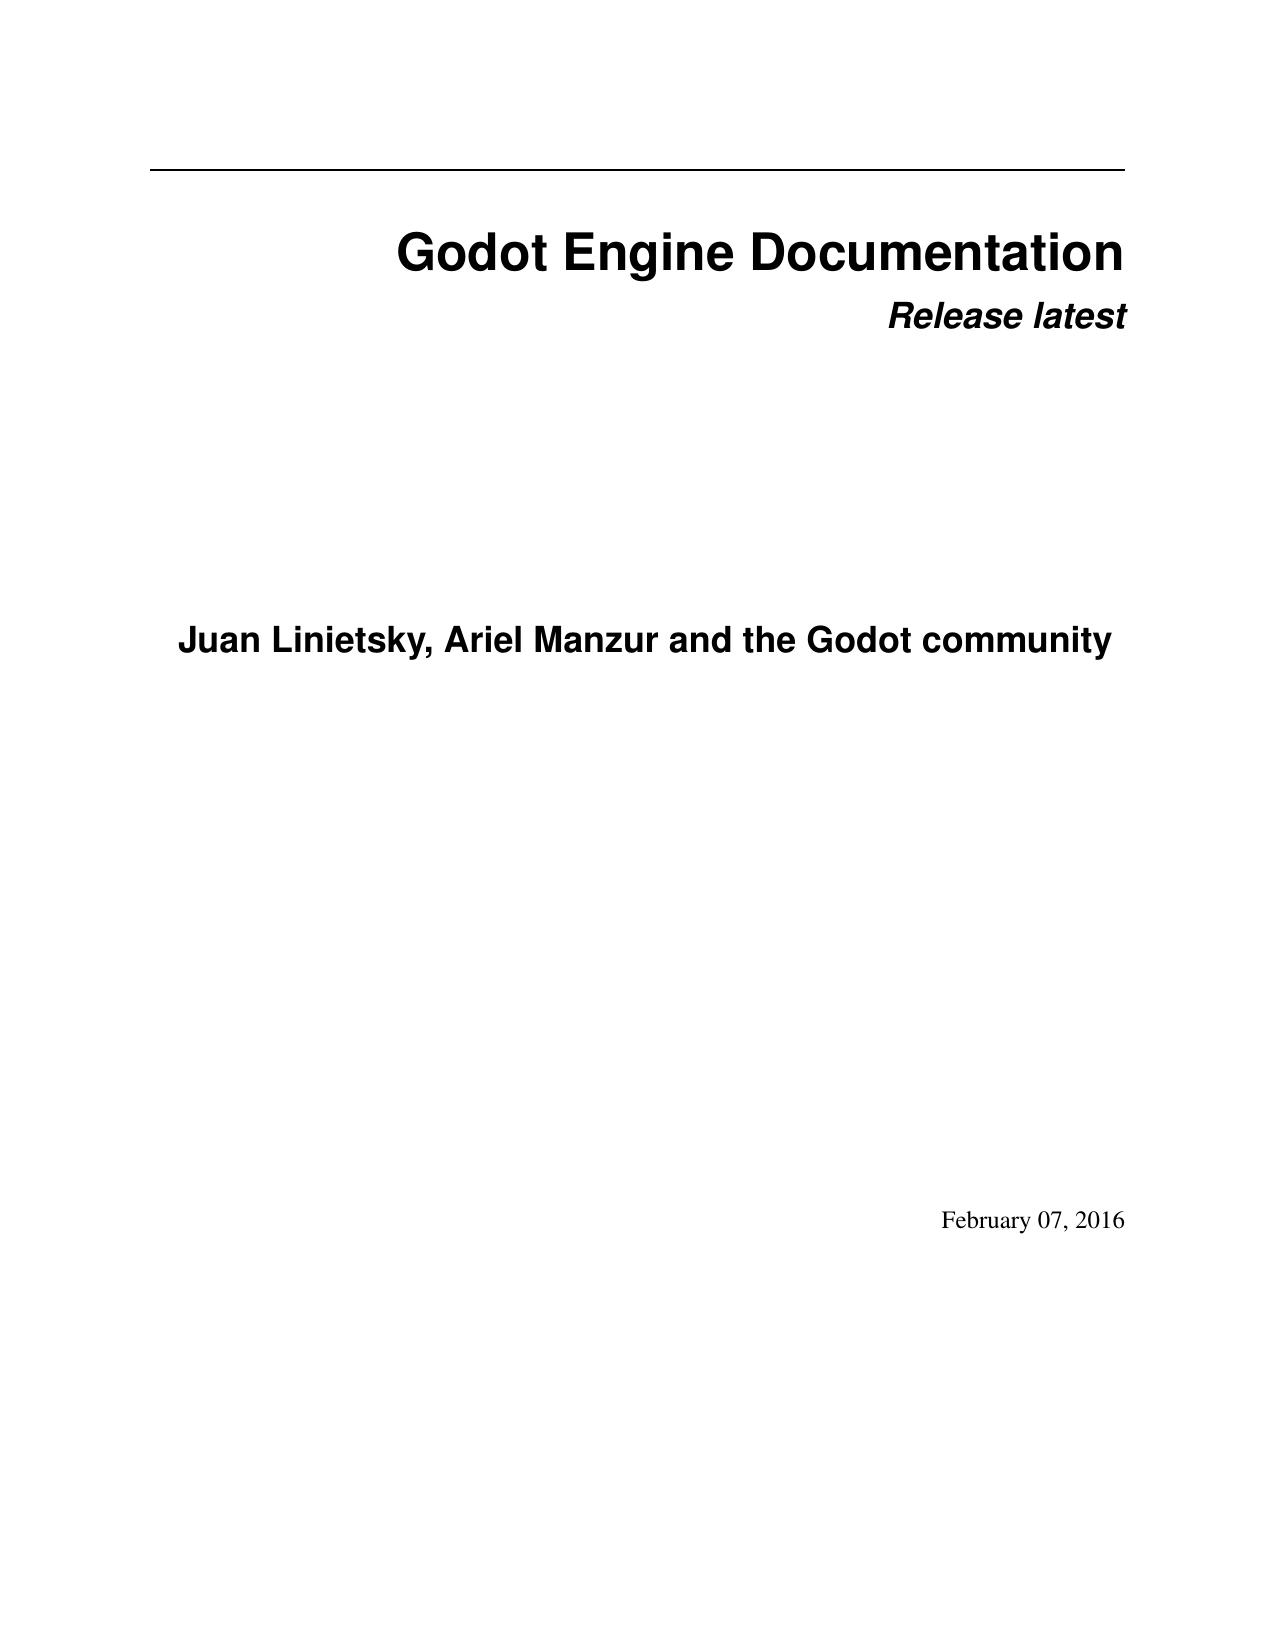 Godot Engine Documentation | manualzz com